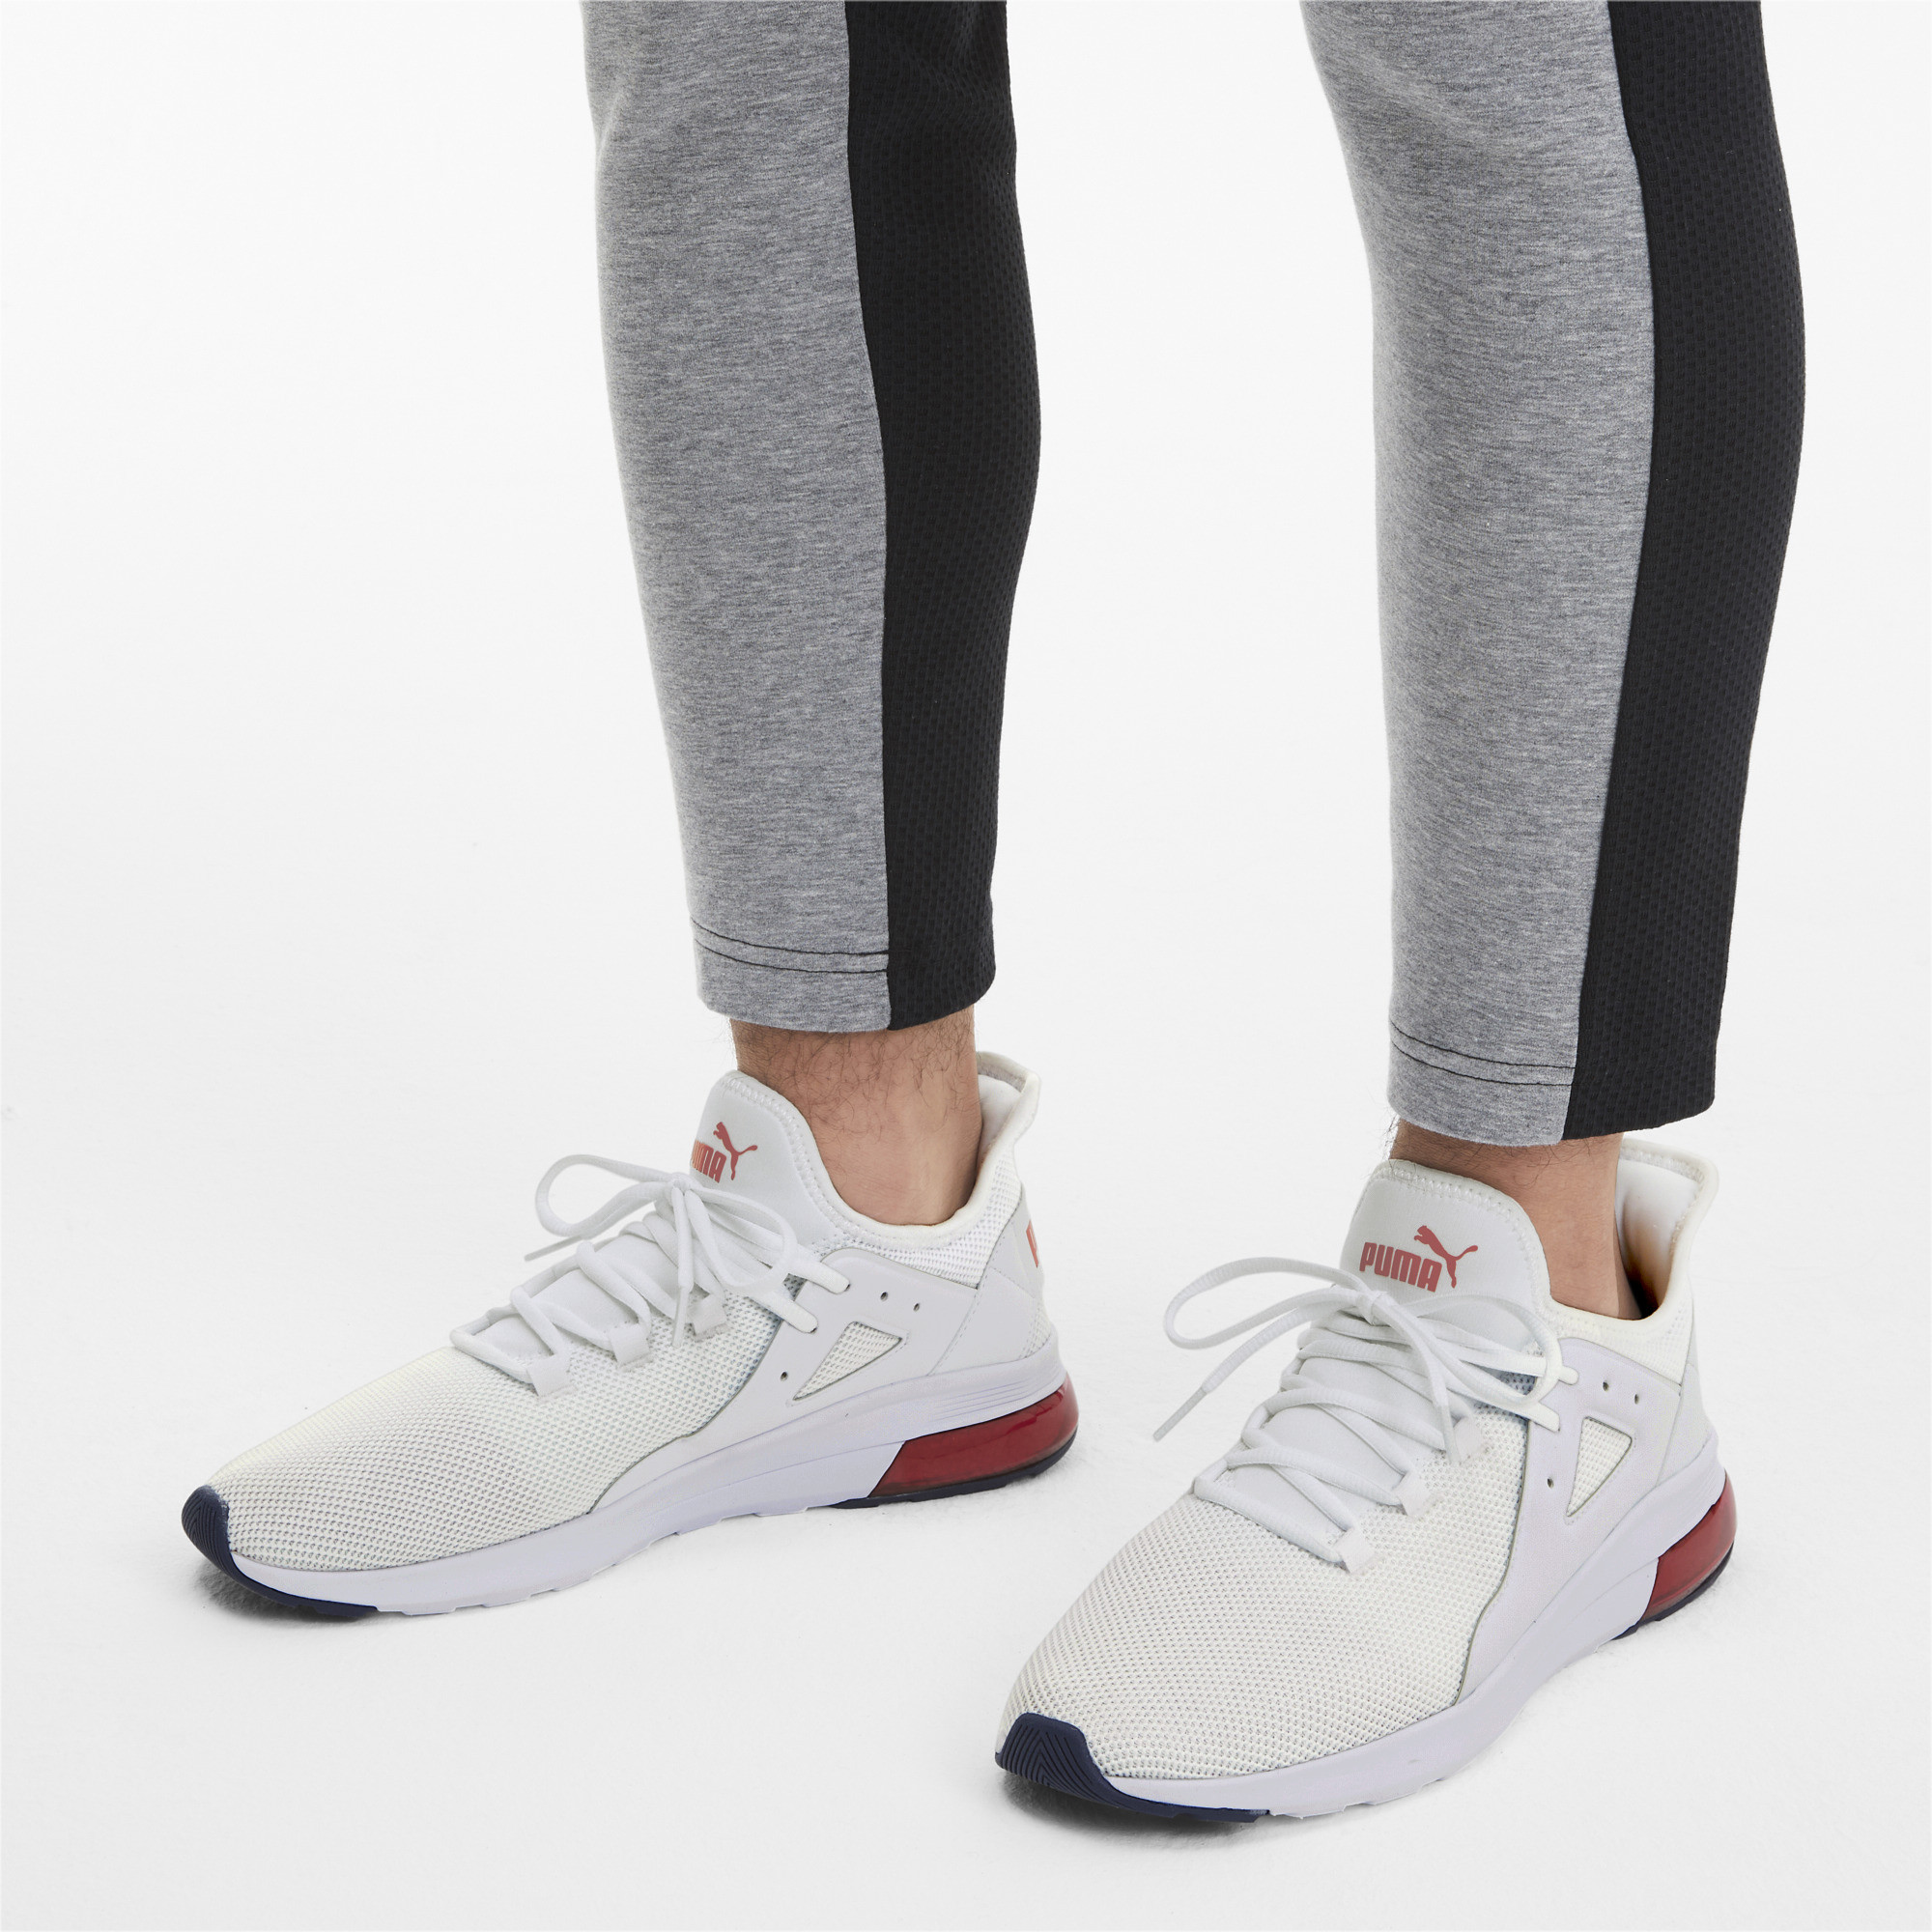 PUMA-Electron-Street-Men-039-s-Sneakers-Men-Shoe-Basics thumbnail 17